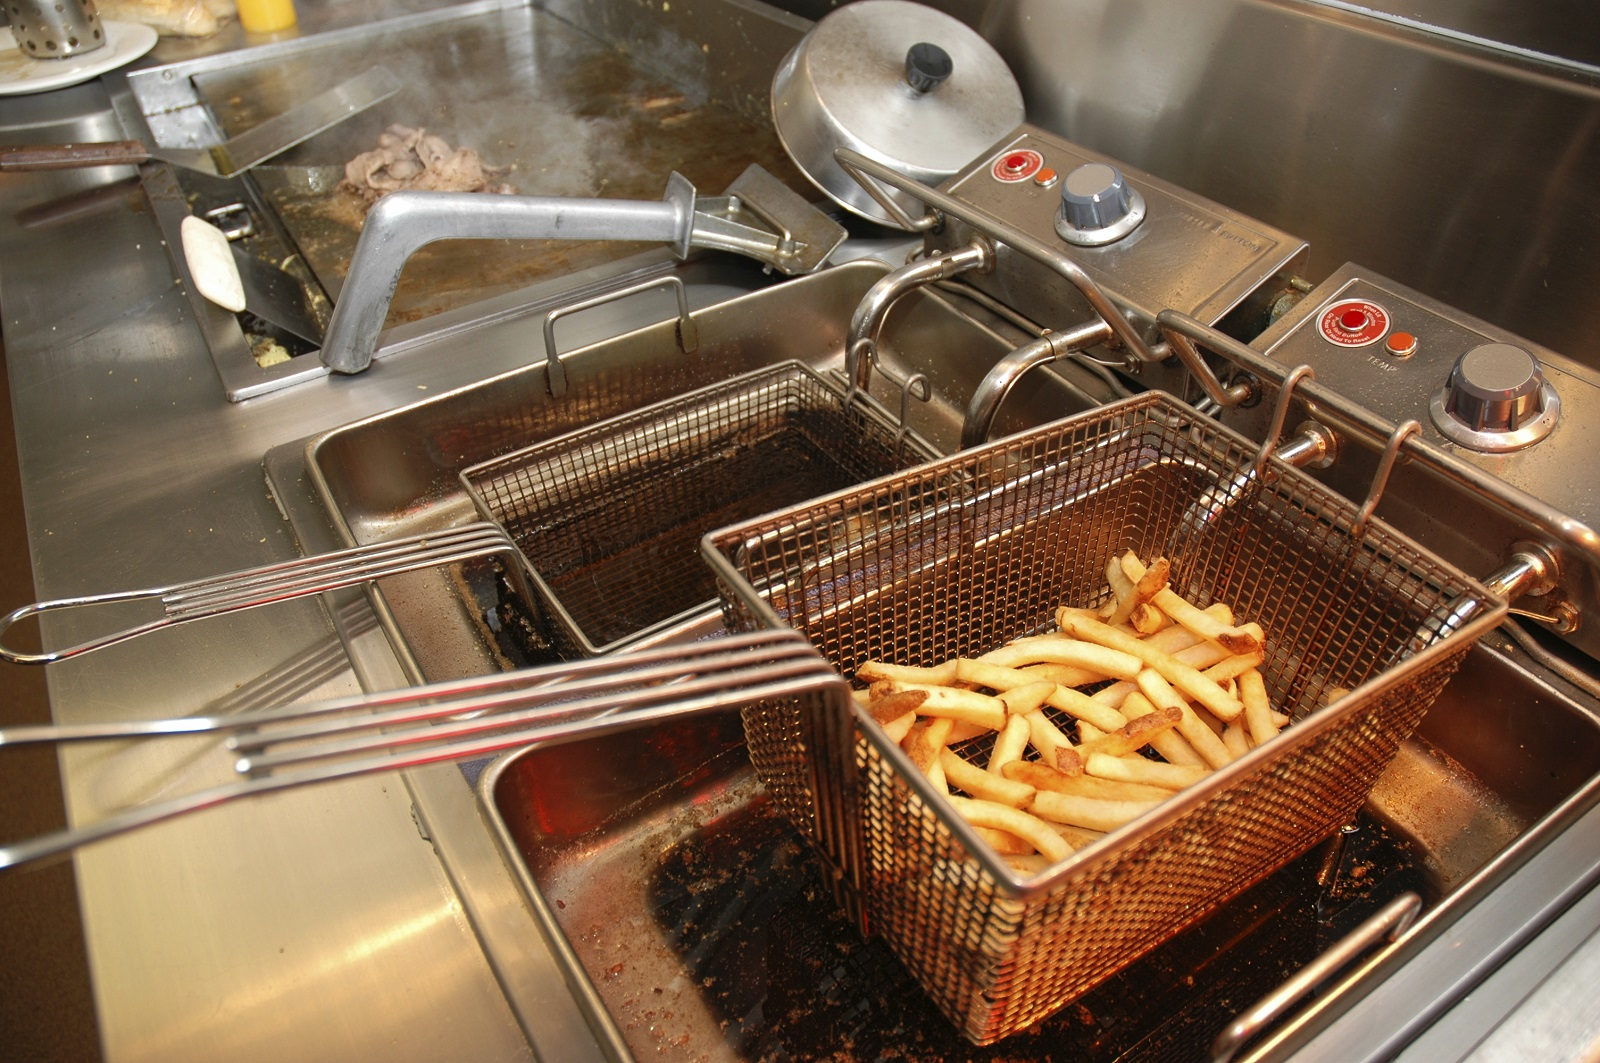 Fast Food Restaurant Equipment List - Culinary Depot